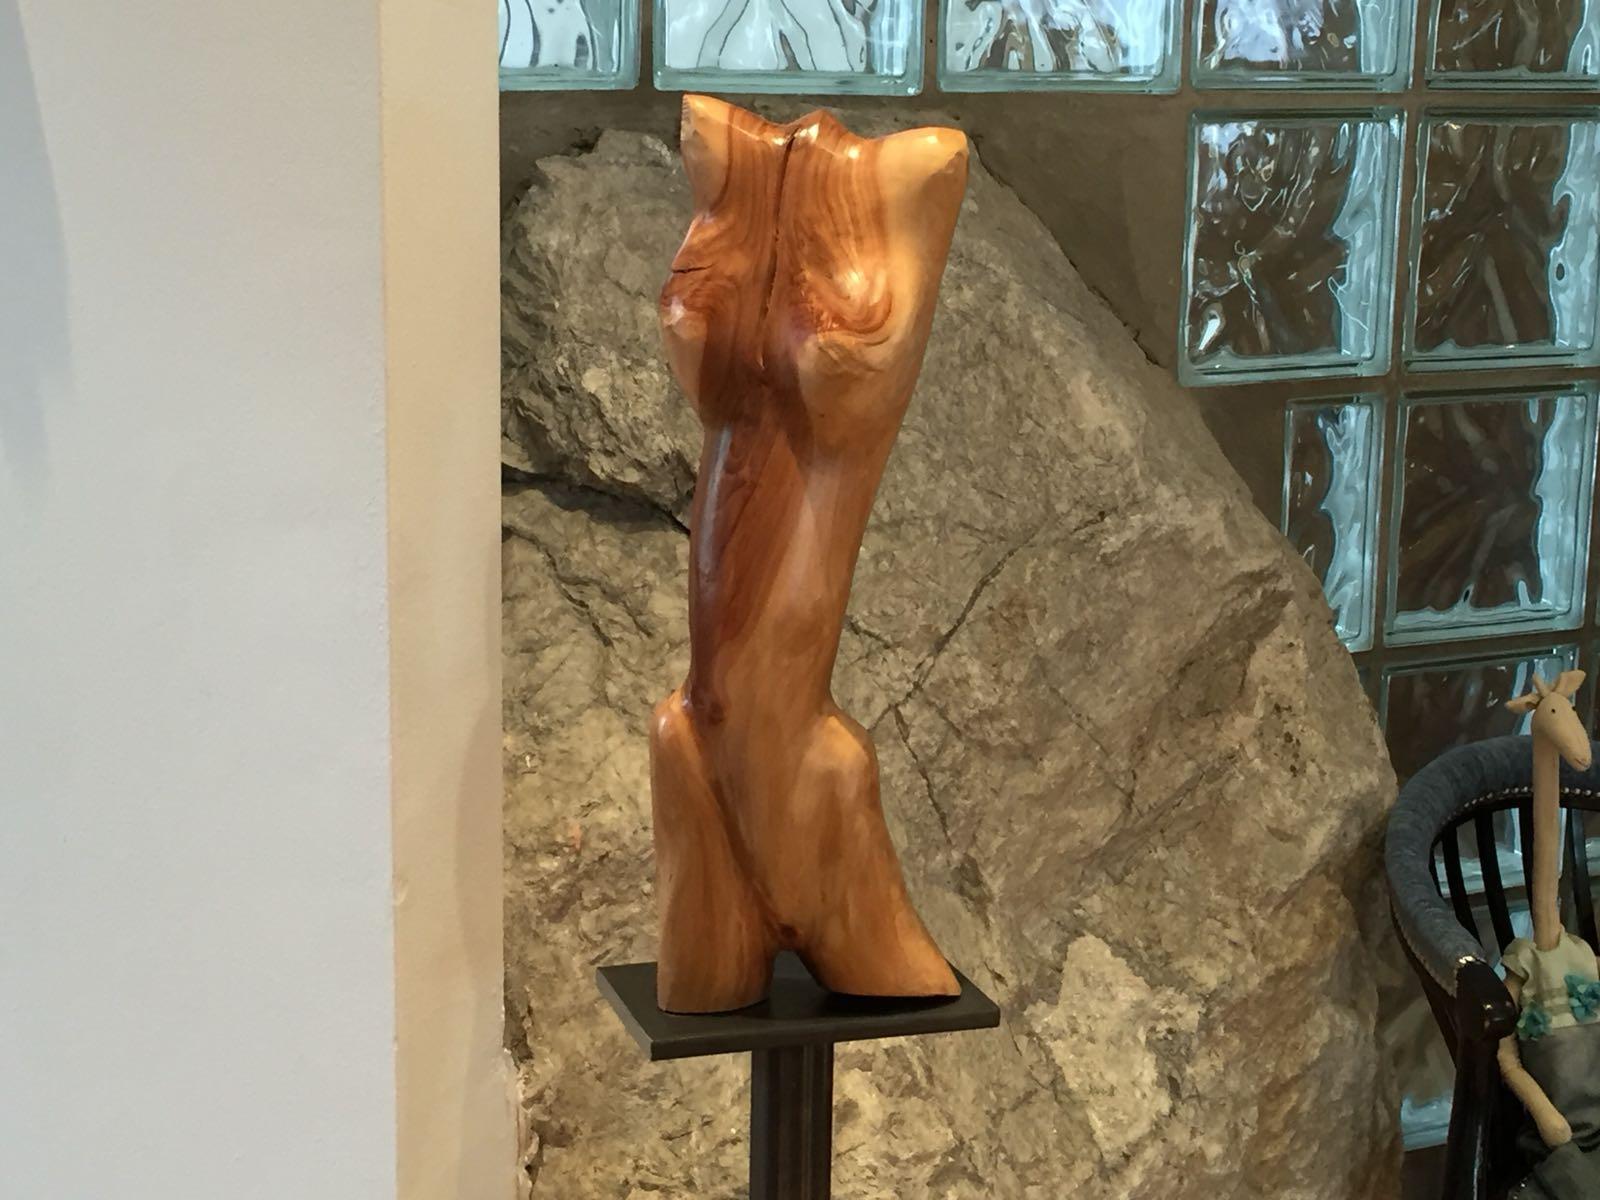 sKunstwerk-Skulptur-Johanna-Tschabitscher-02